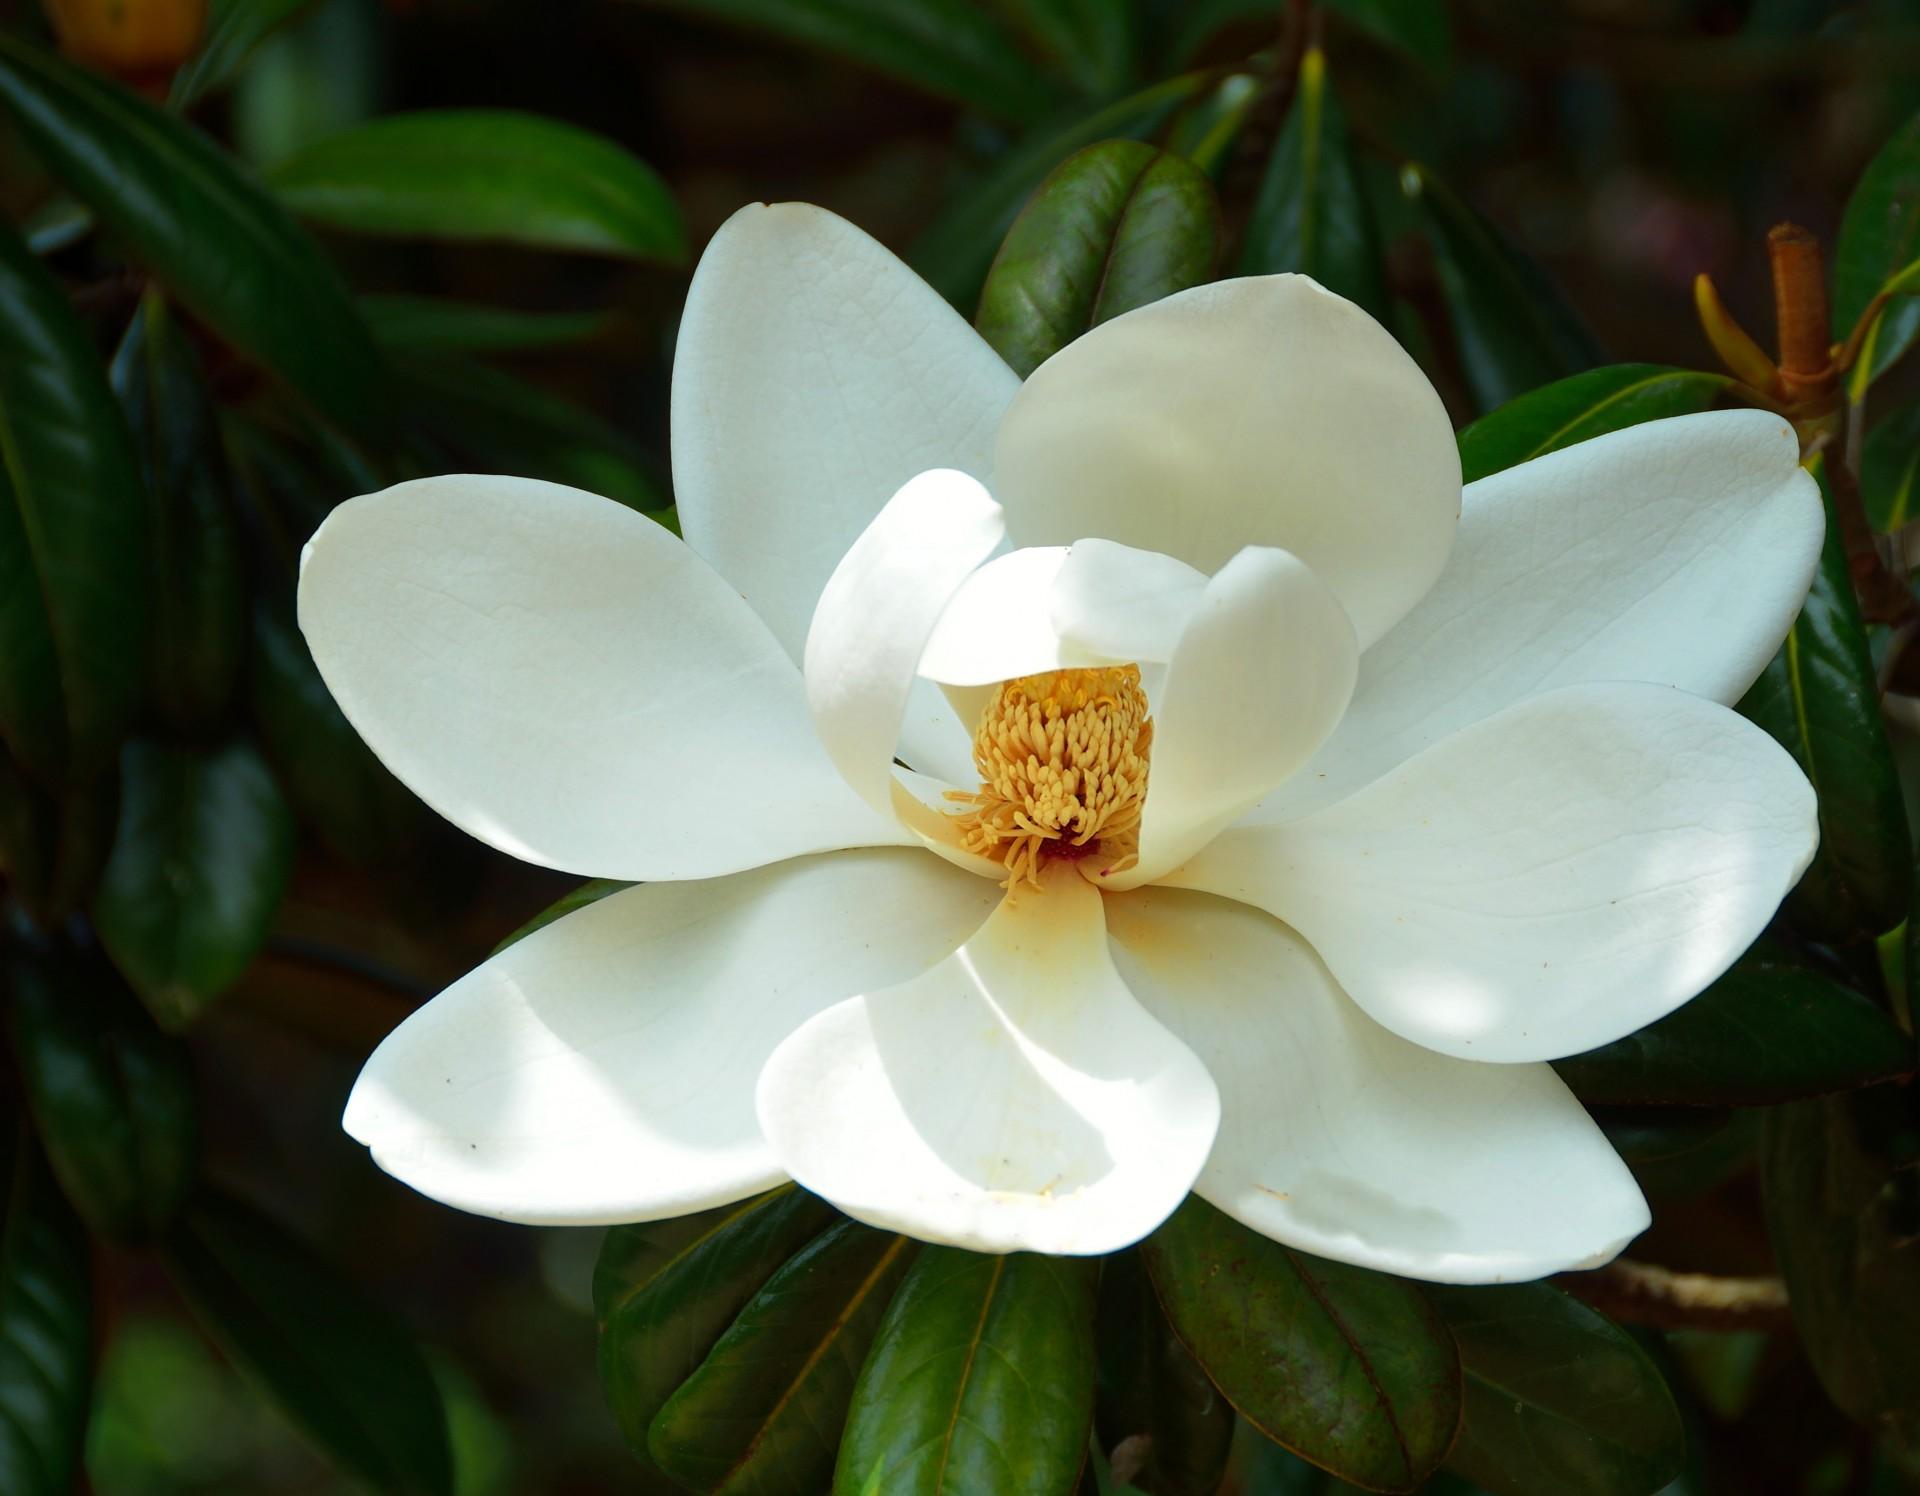 Magnoliaflowertreetropicalwhite Free Photo From Needpixcom